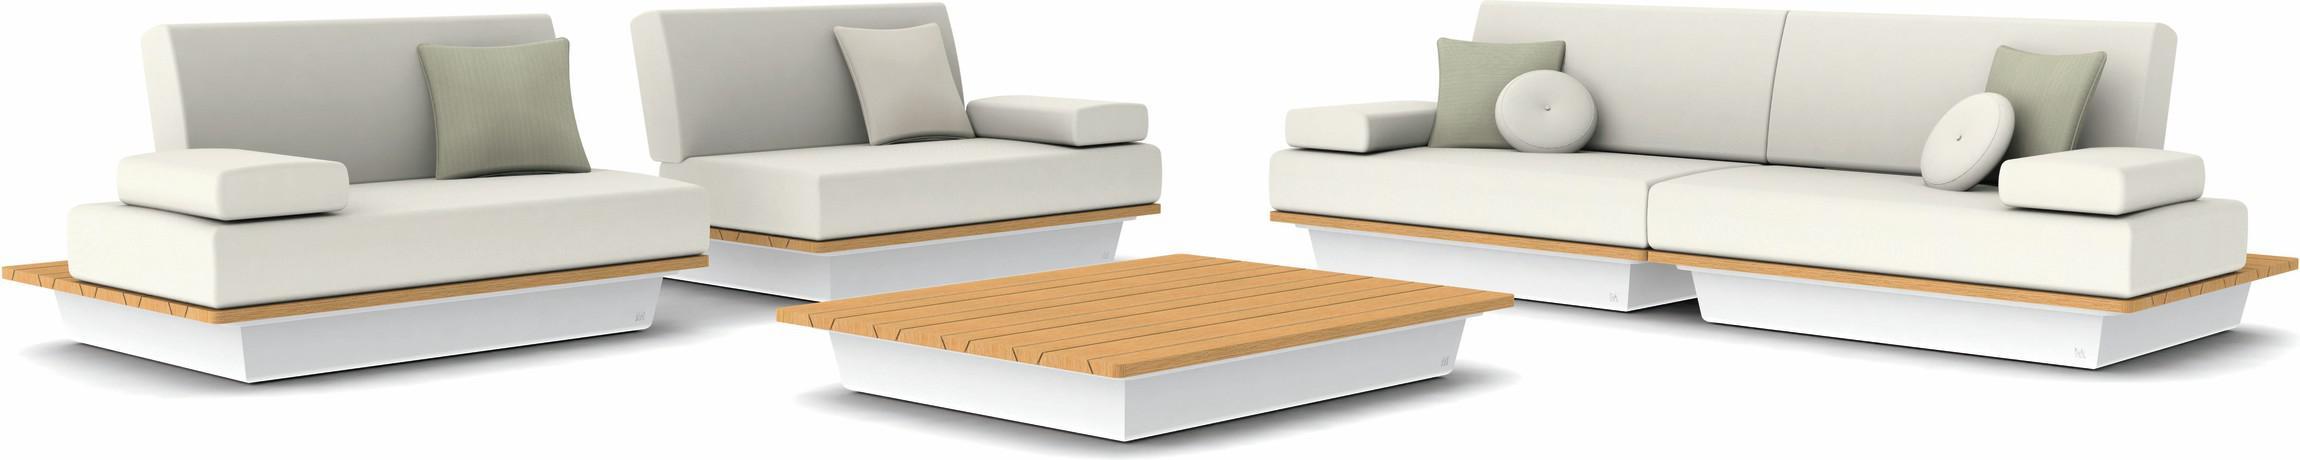 Air concept 3 - white - wood top iroko